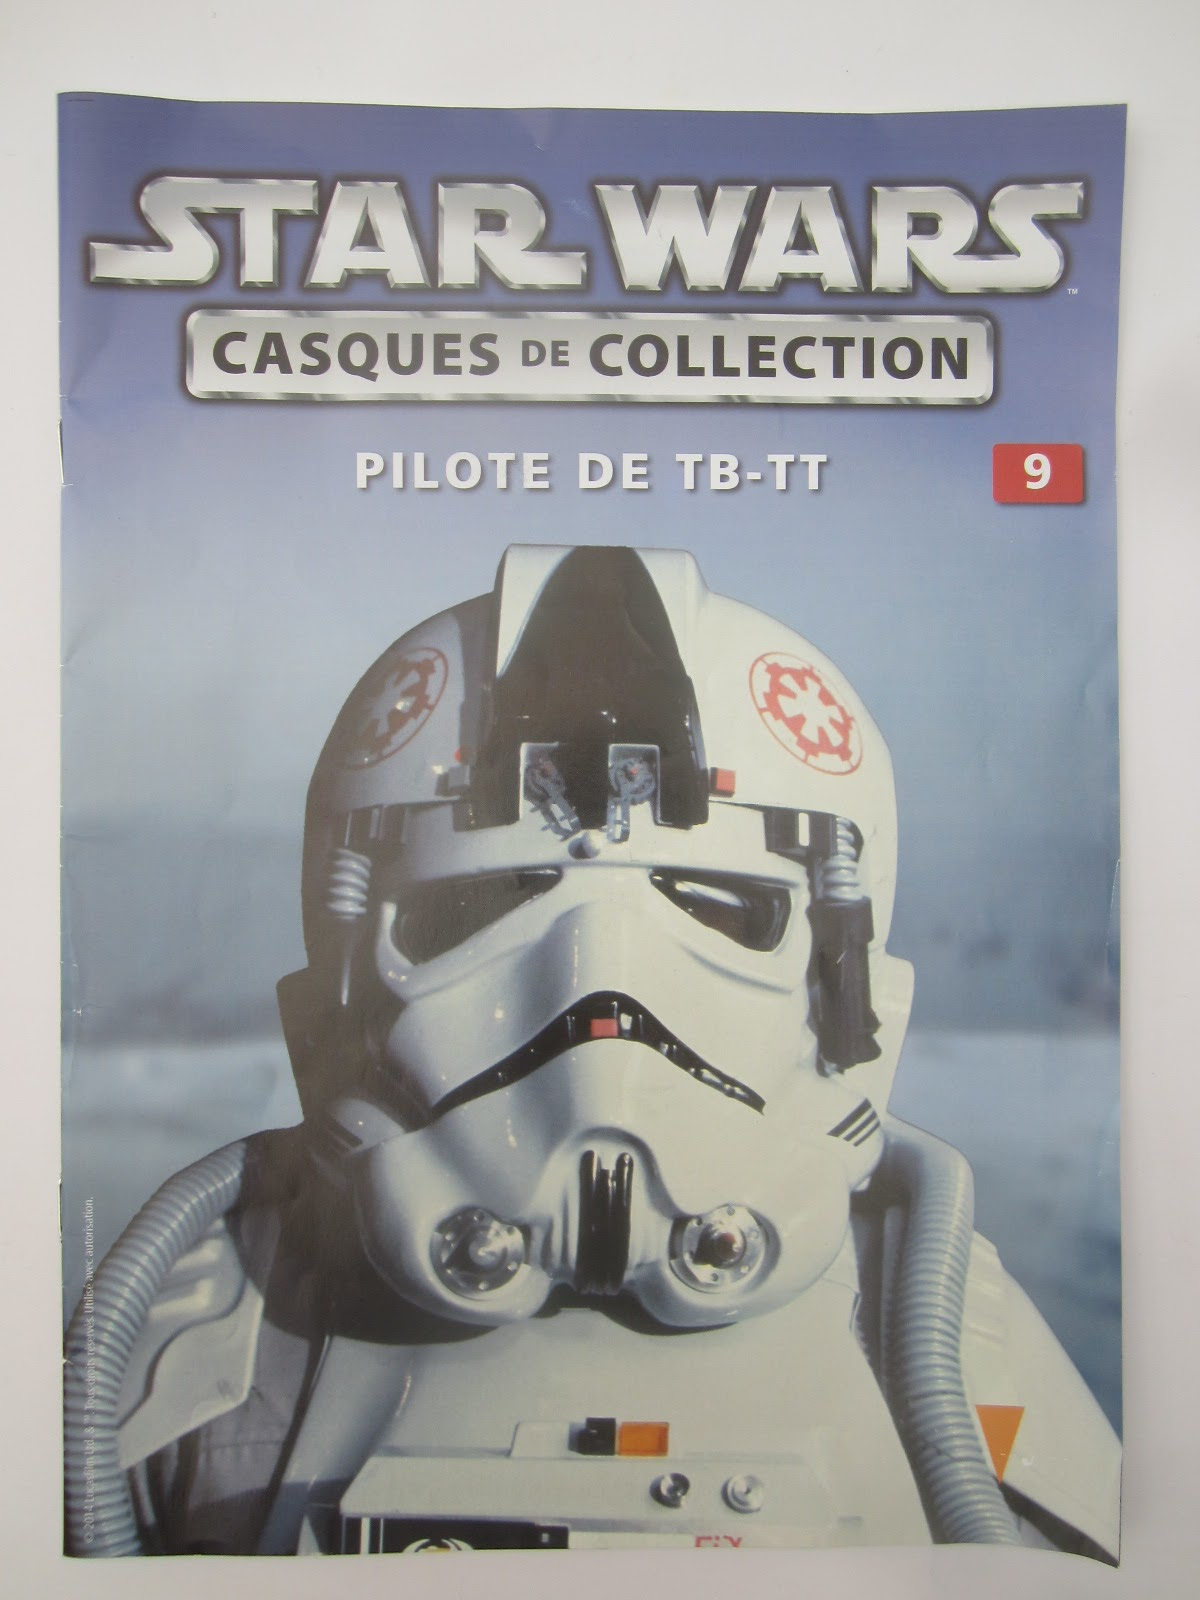 Star wars collection casques de collection 9 pilote de - Lego star wars tb tt ...